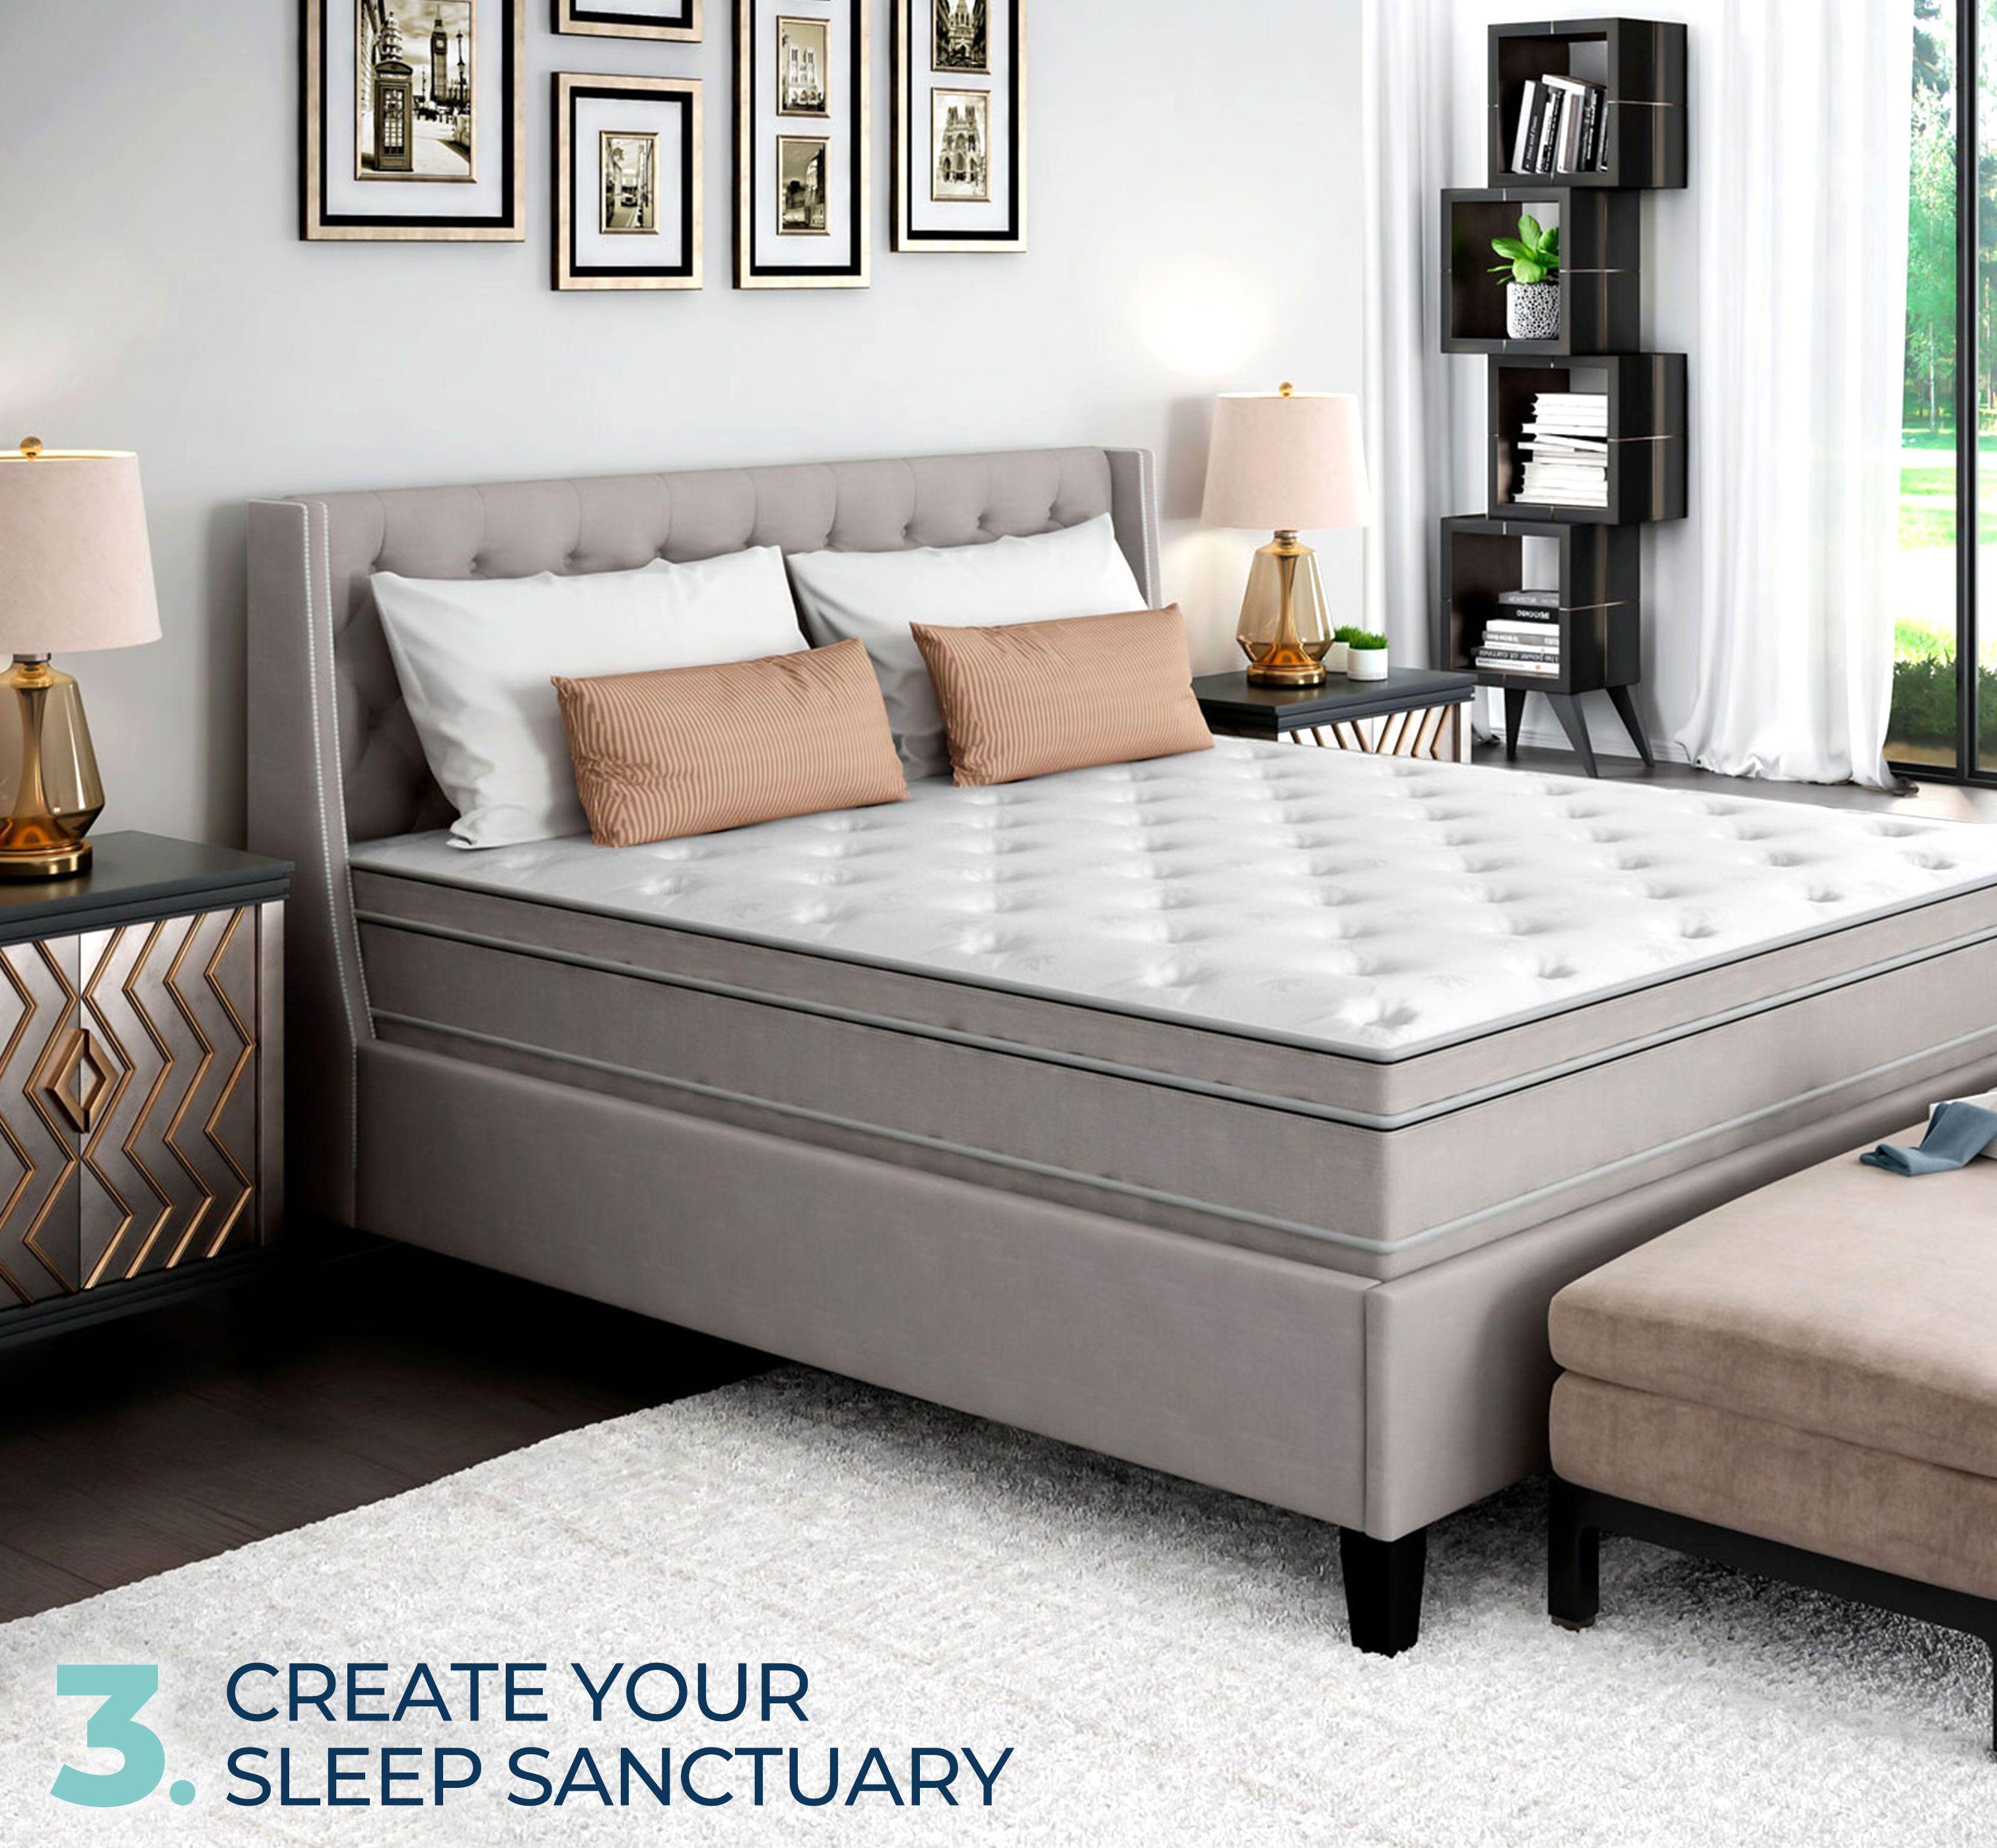 Create an environment conducive to sleep, your Sleep